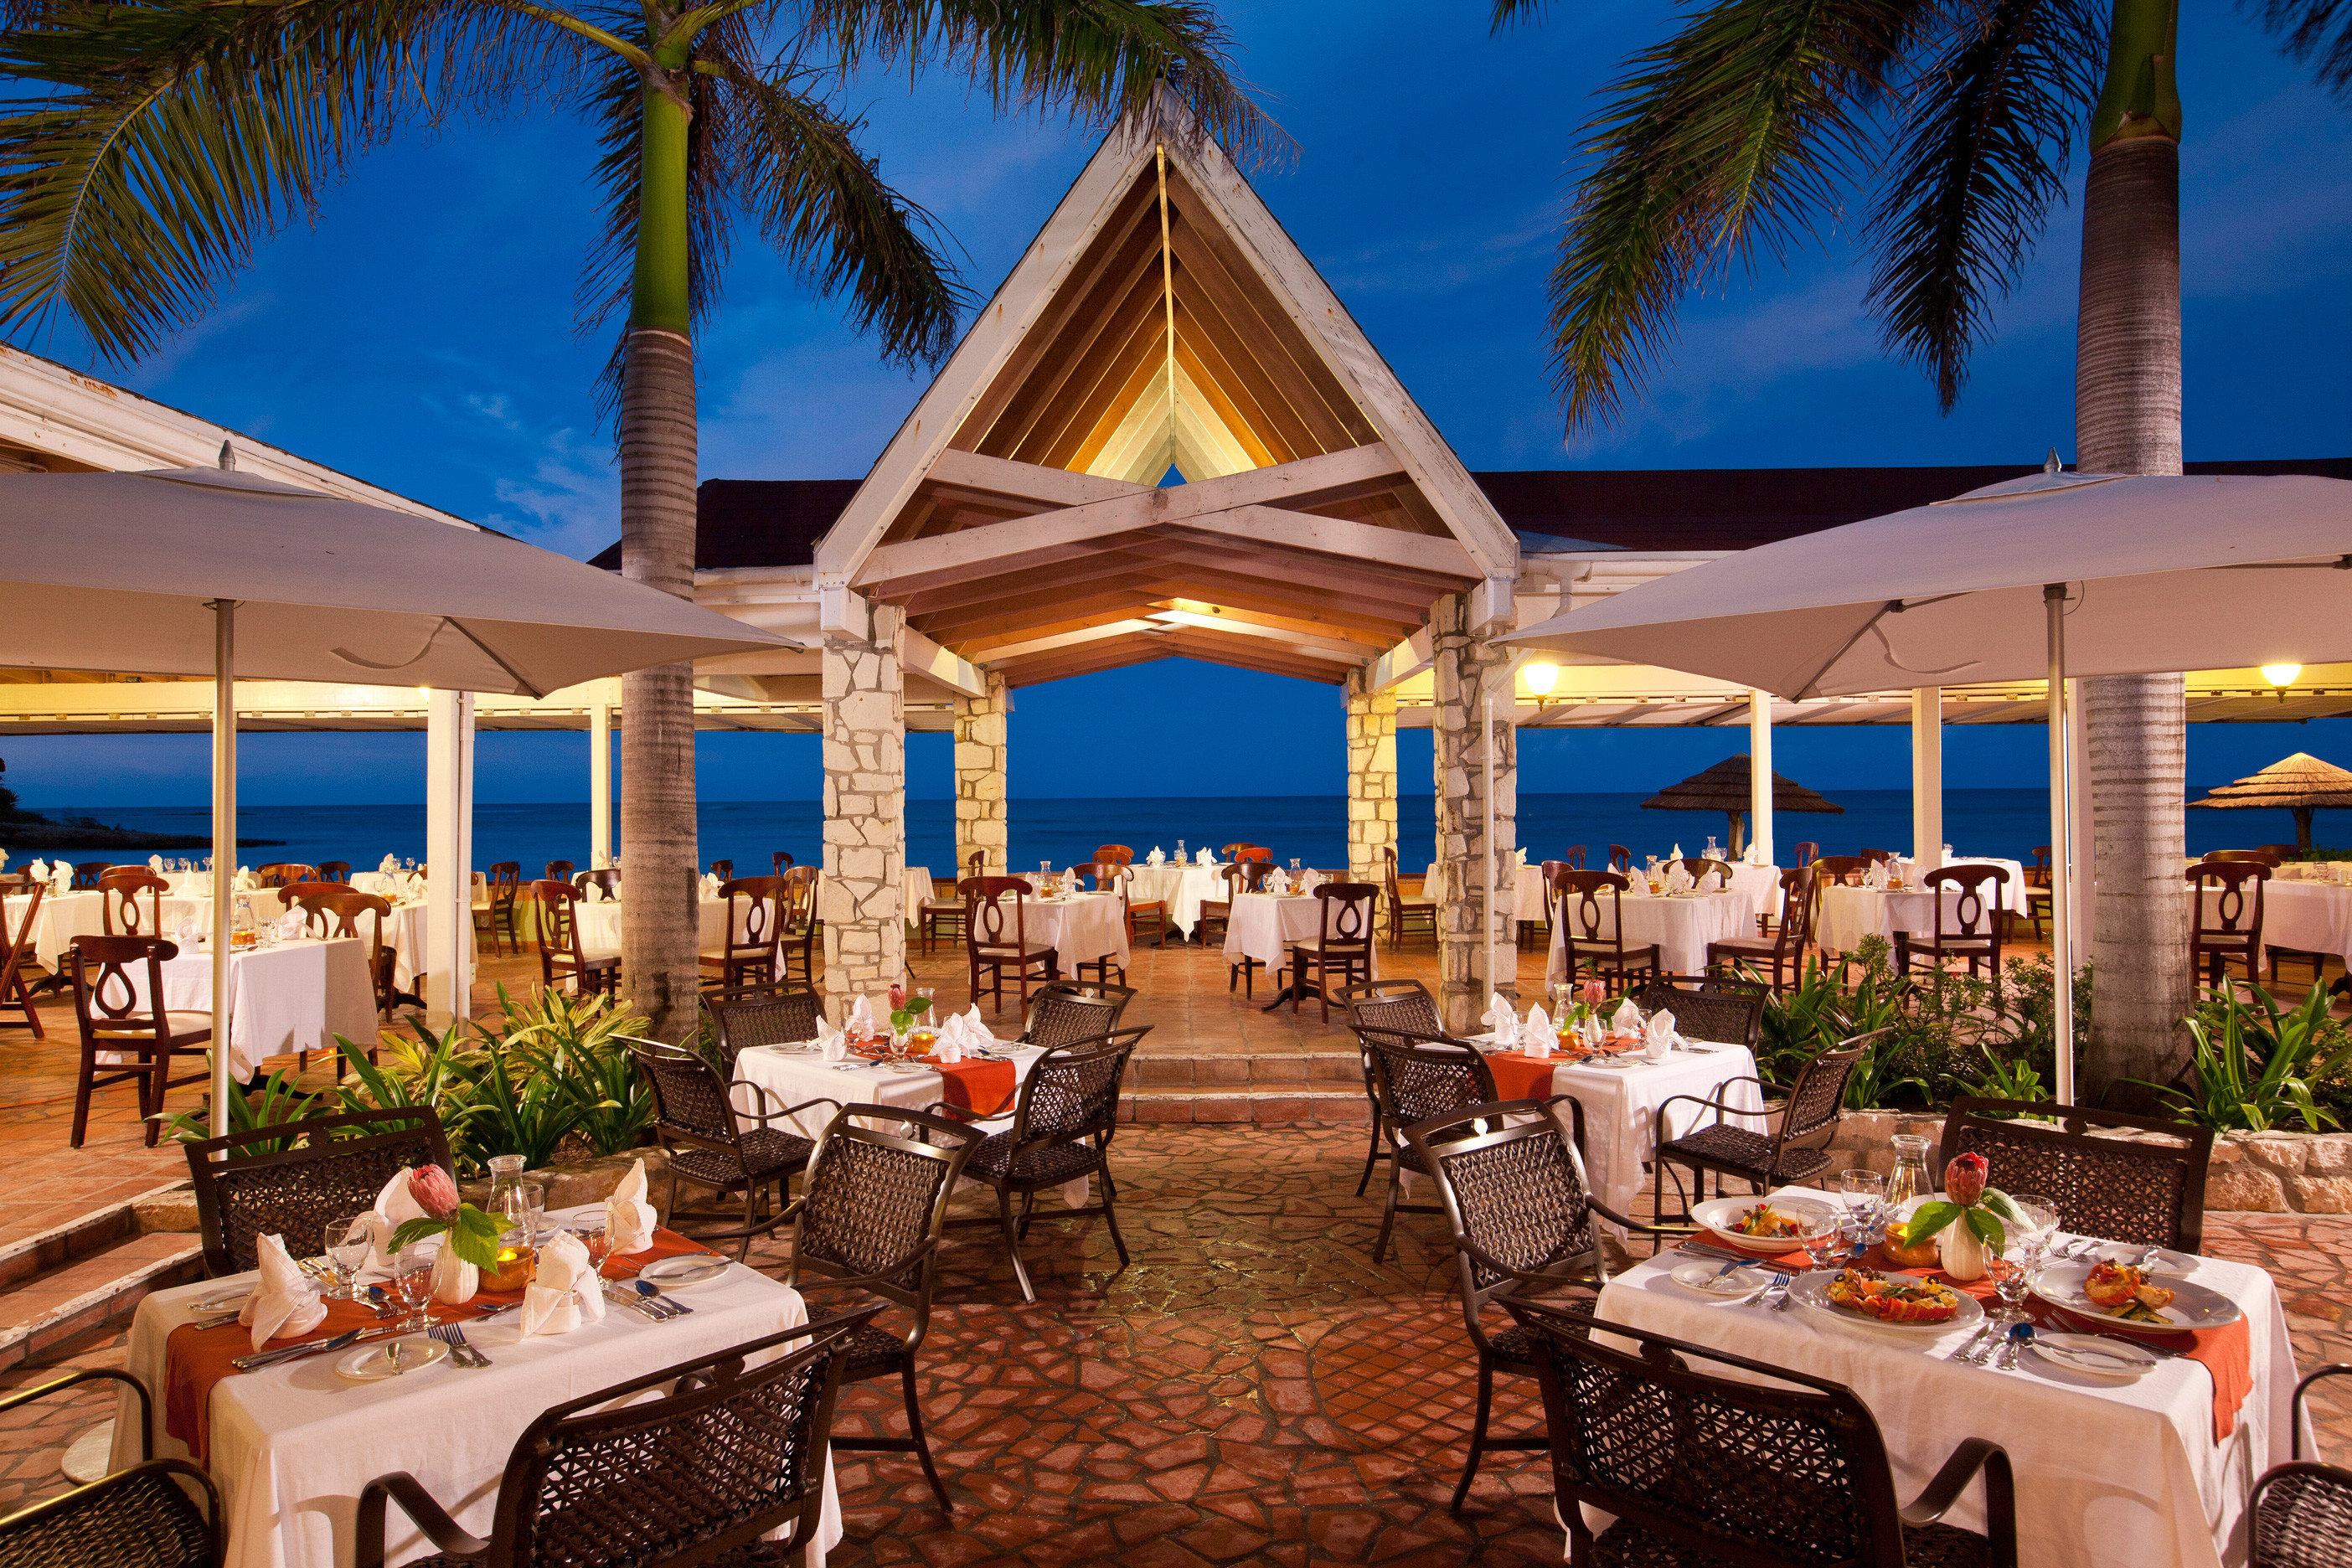 tree chair Picnic Dining Resort function hall wedding restaurant wedding reception lawn set Garden